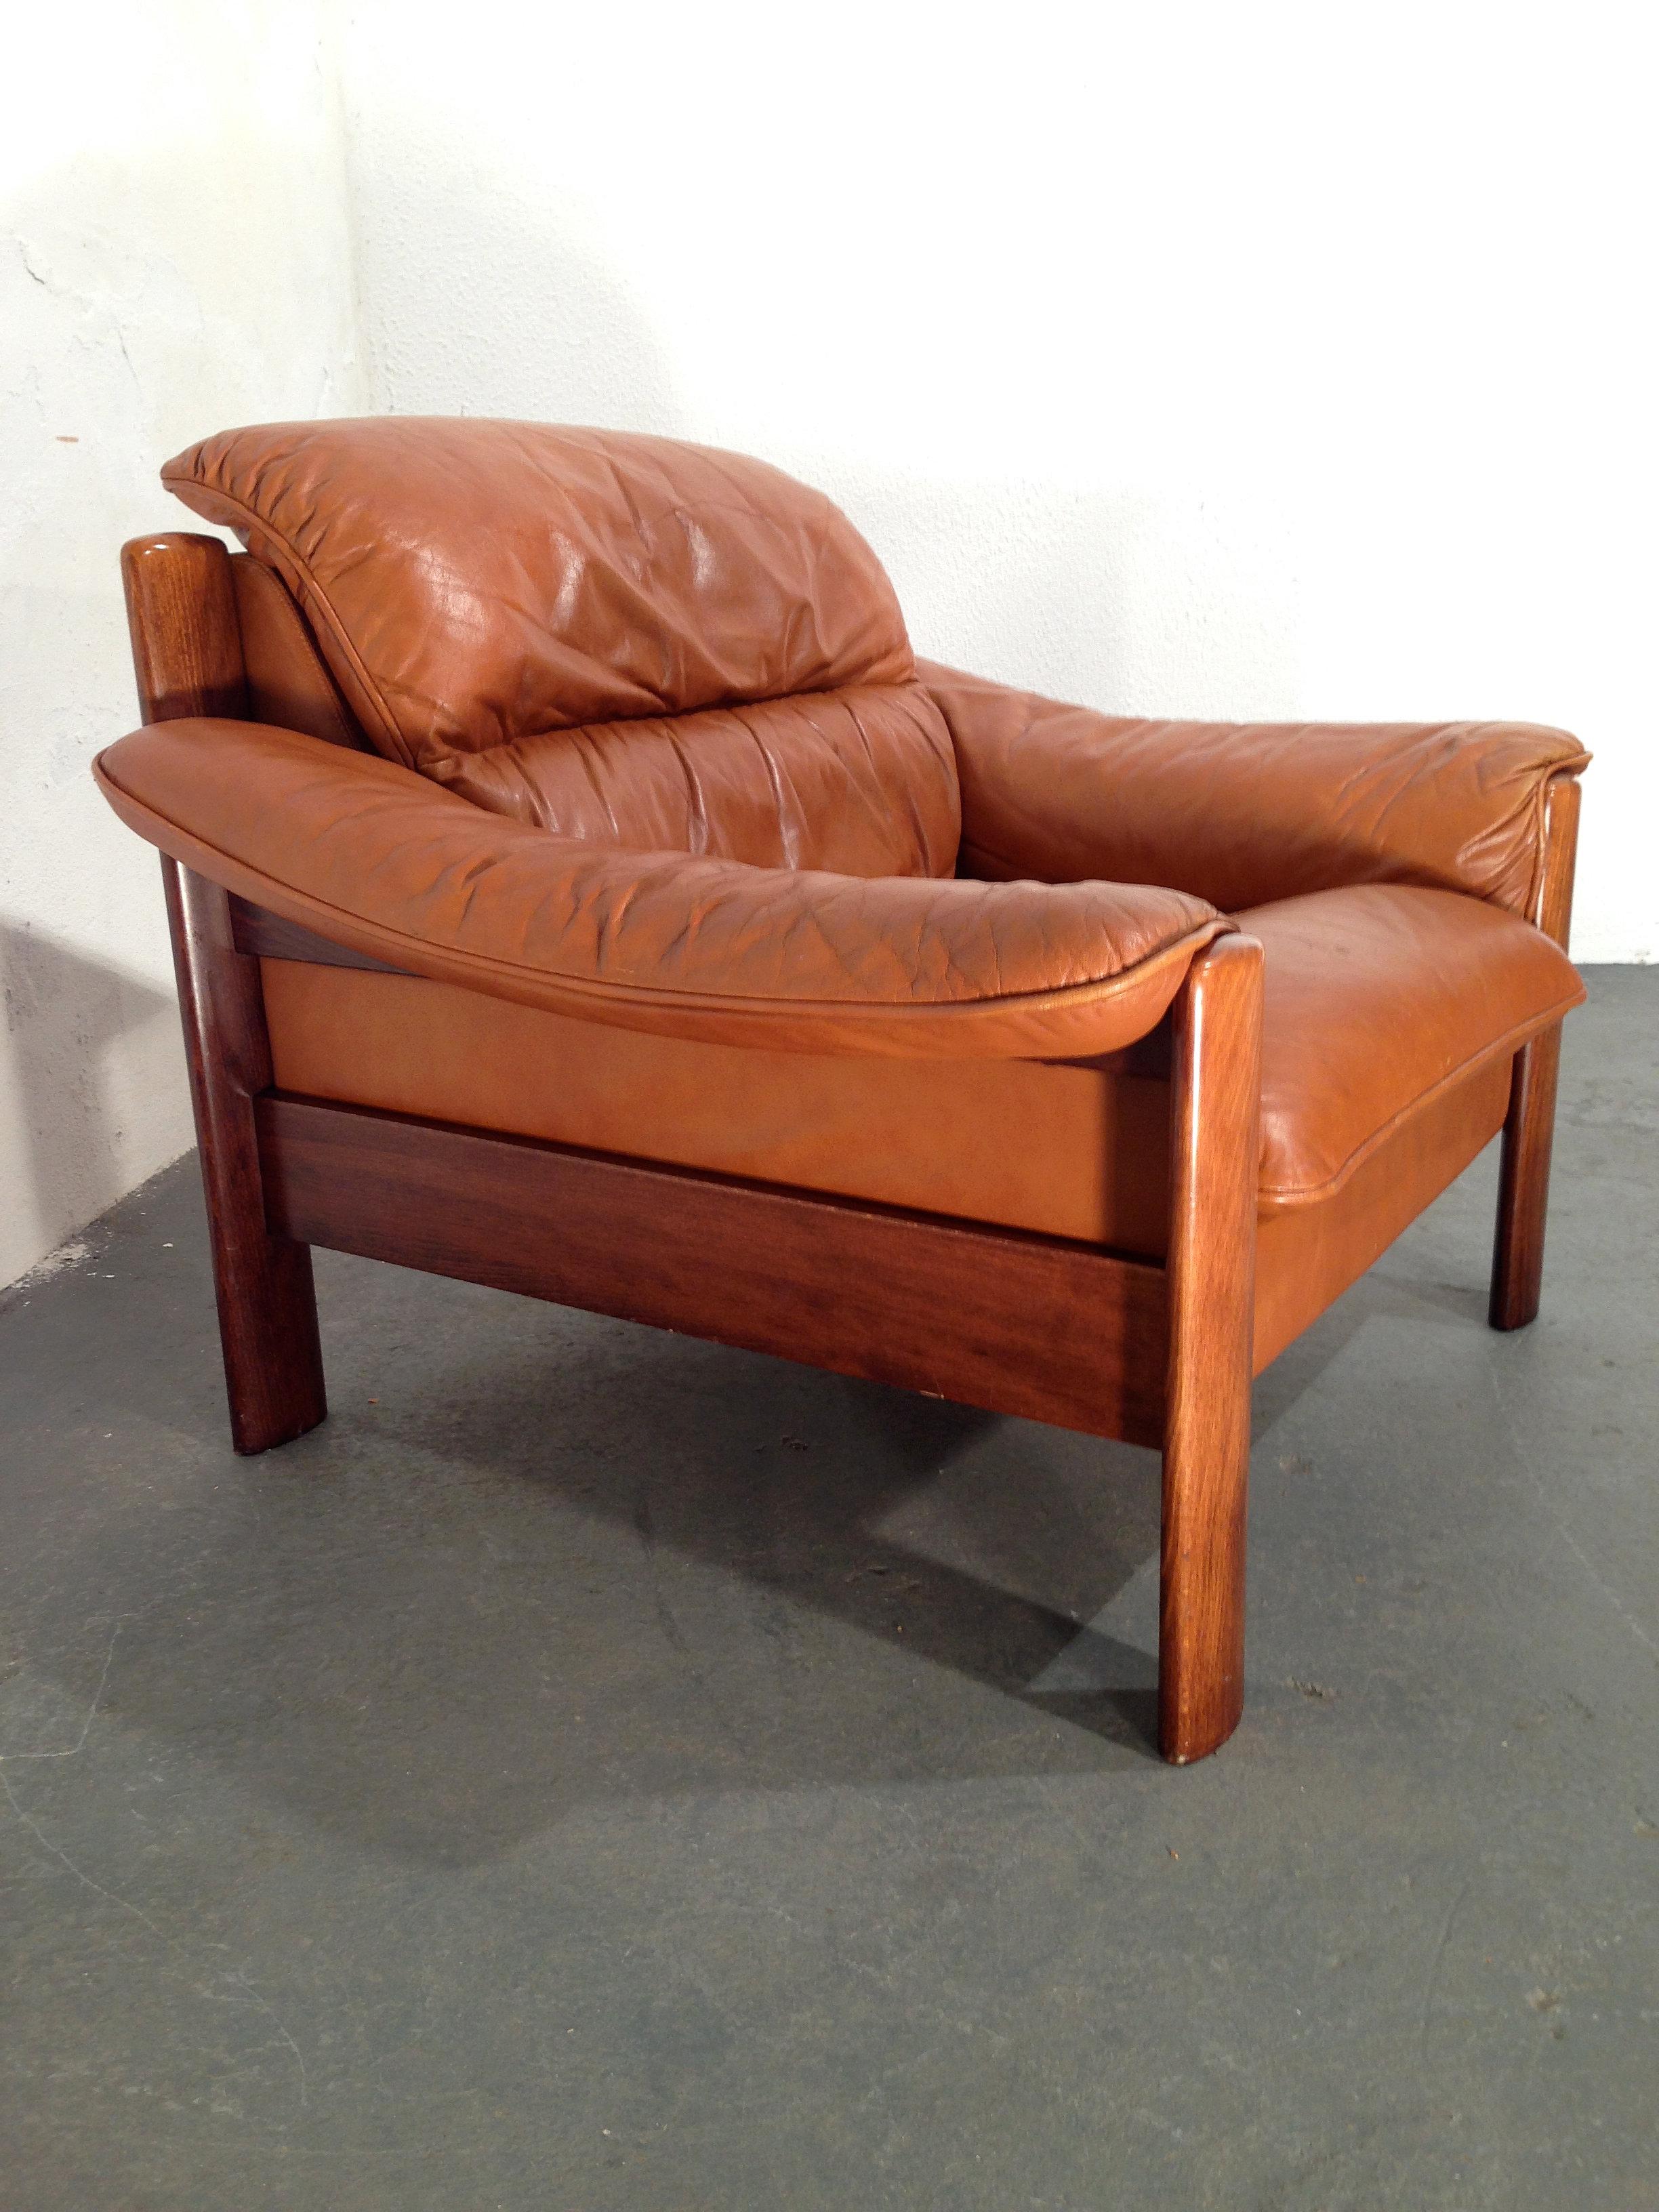 Vintage 20th Century Design 1970s Scandinavian Armchair